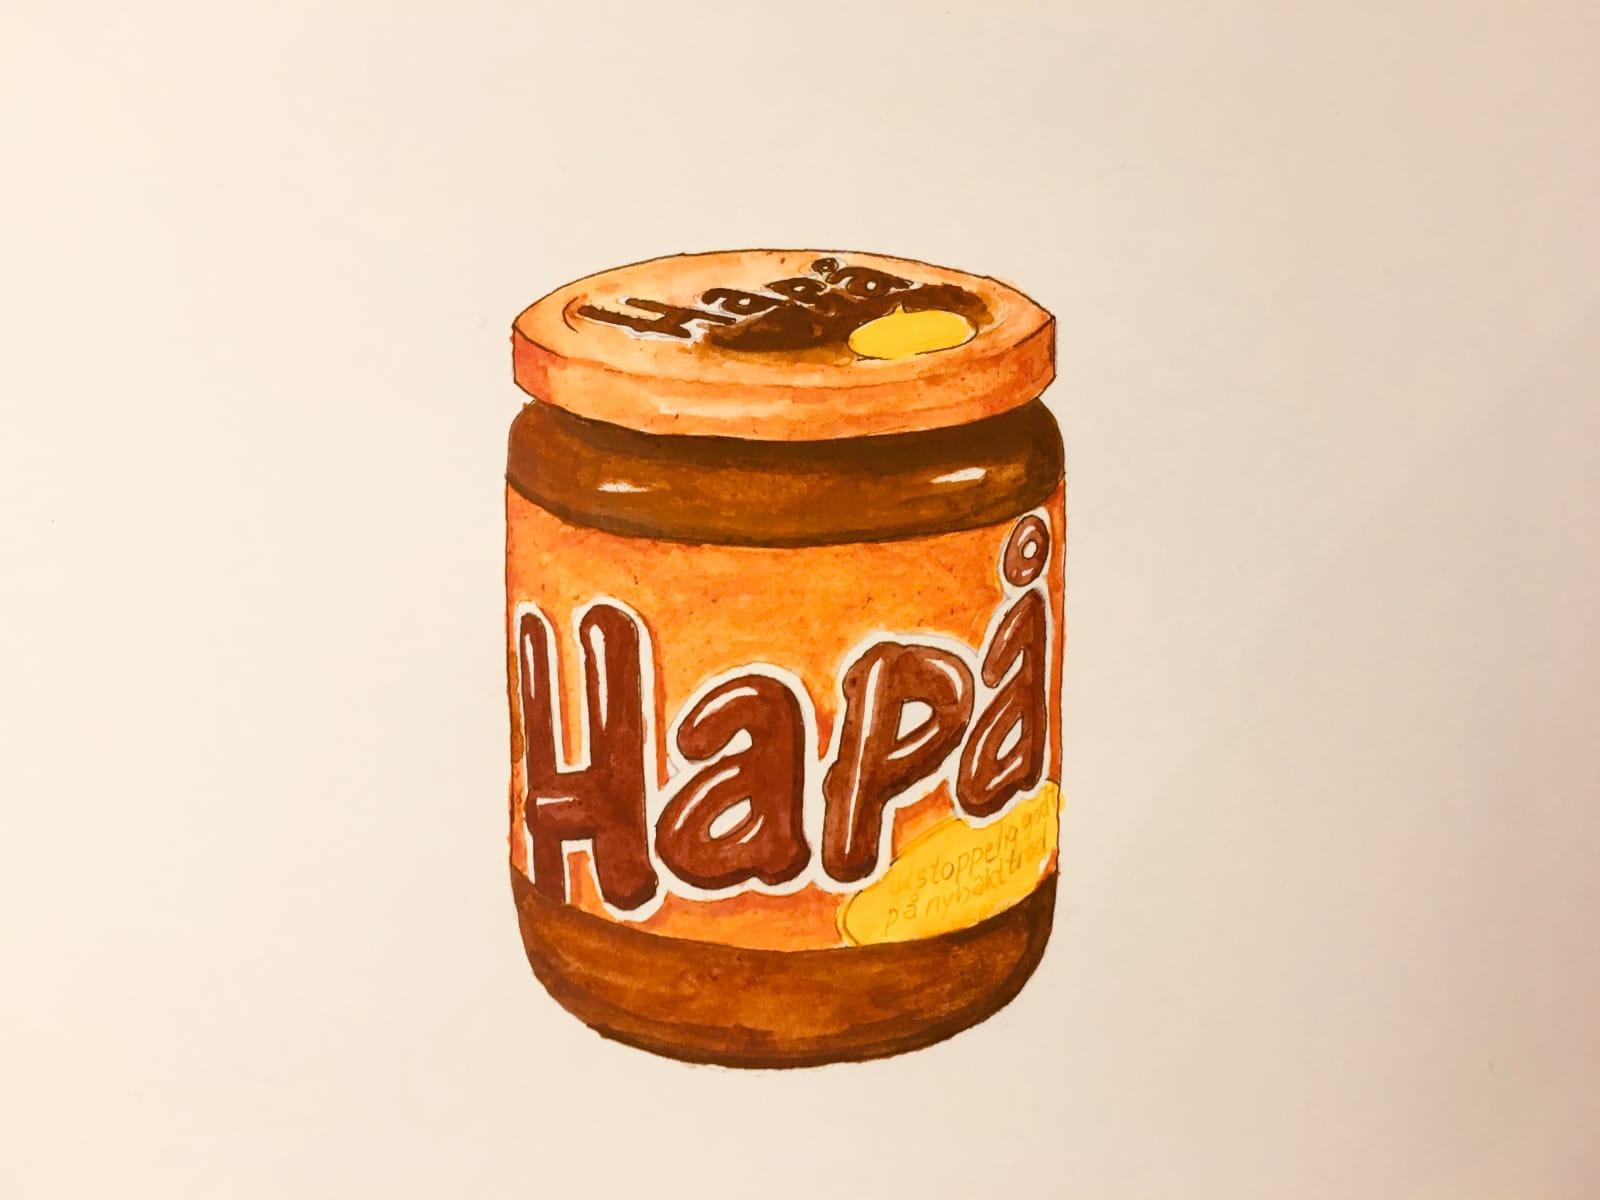 Torbjørns svigersønn, Christian Fjeldbu, er illustratør og malte et HaPå-glass i akvarell til jubilanten. Stjerne i boken!